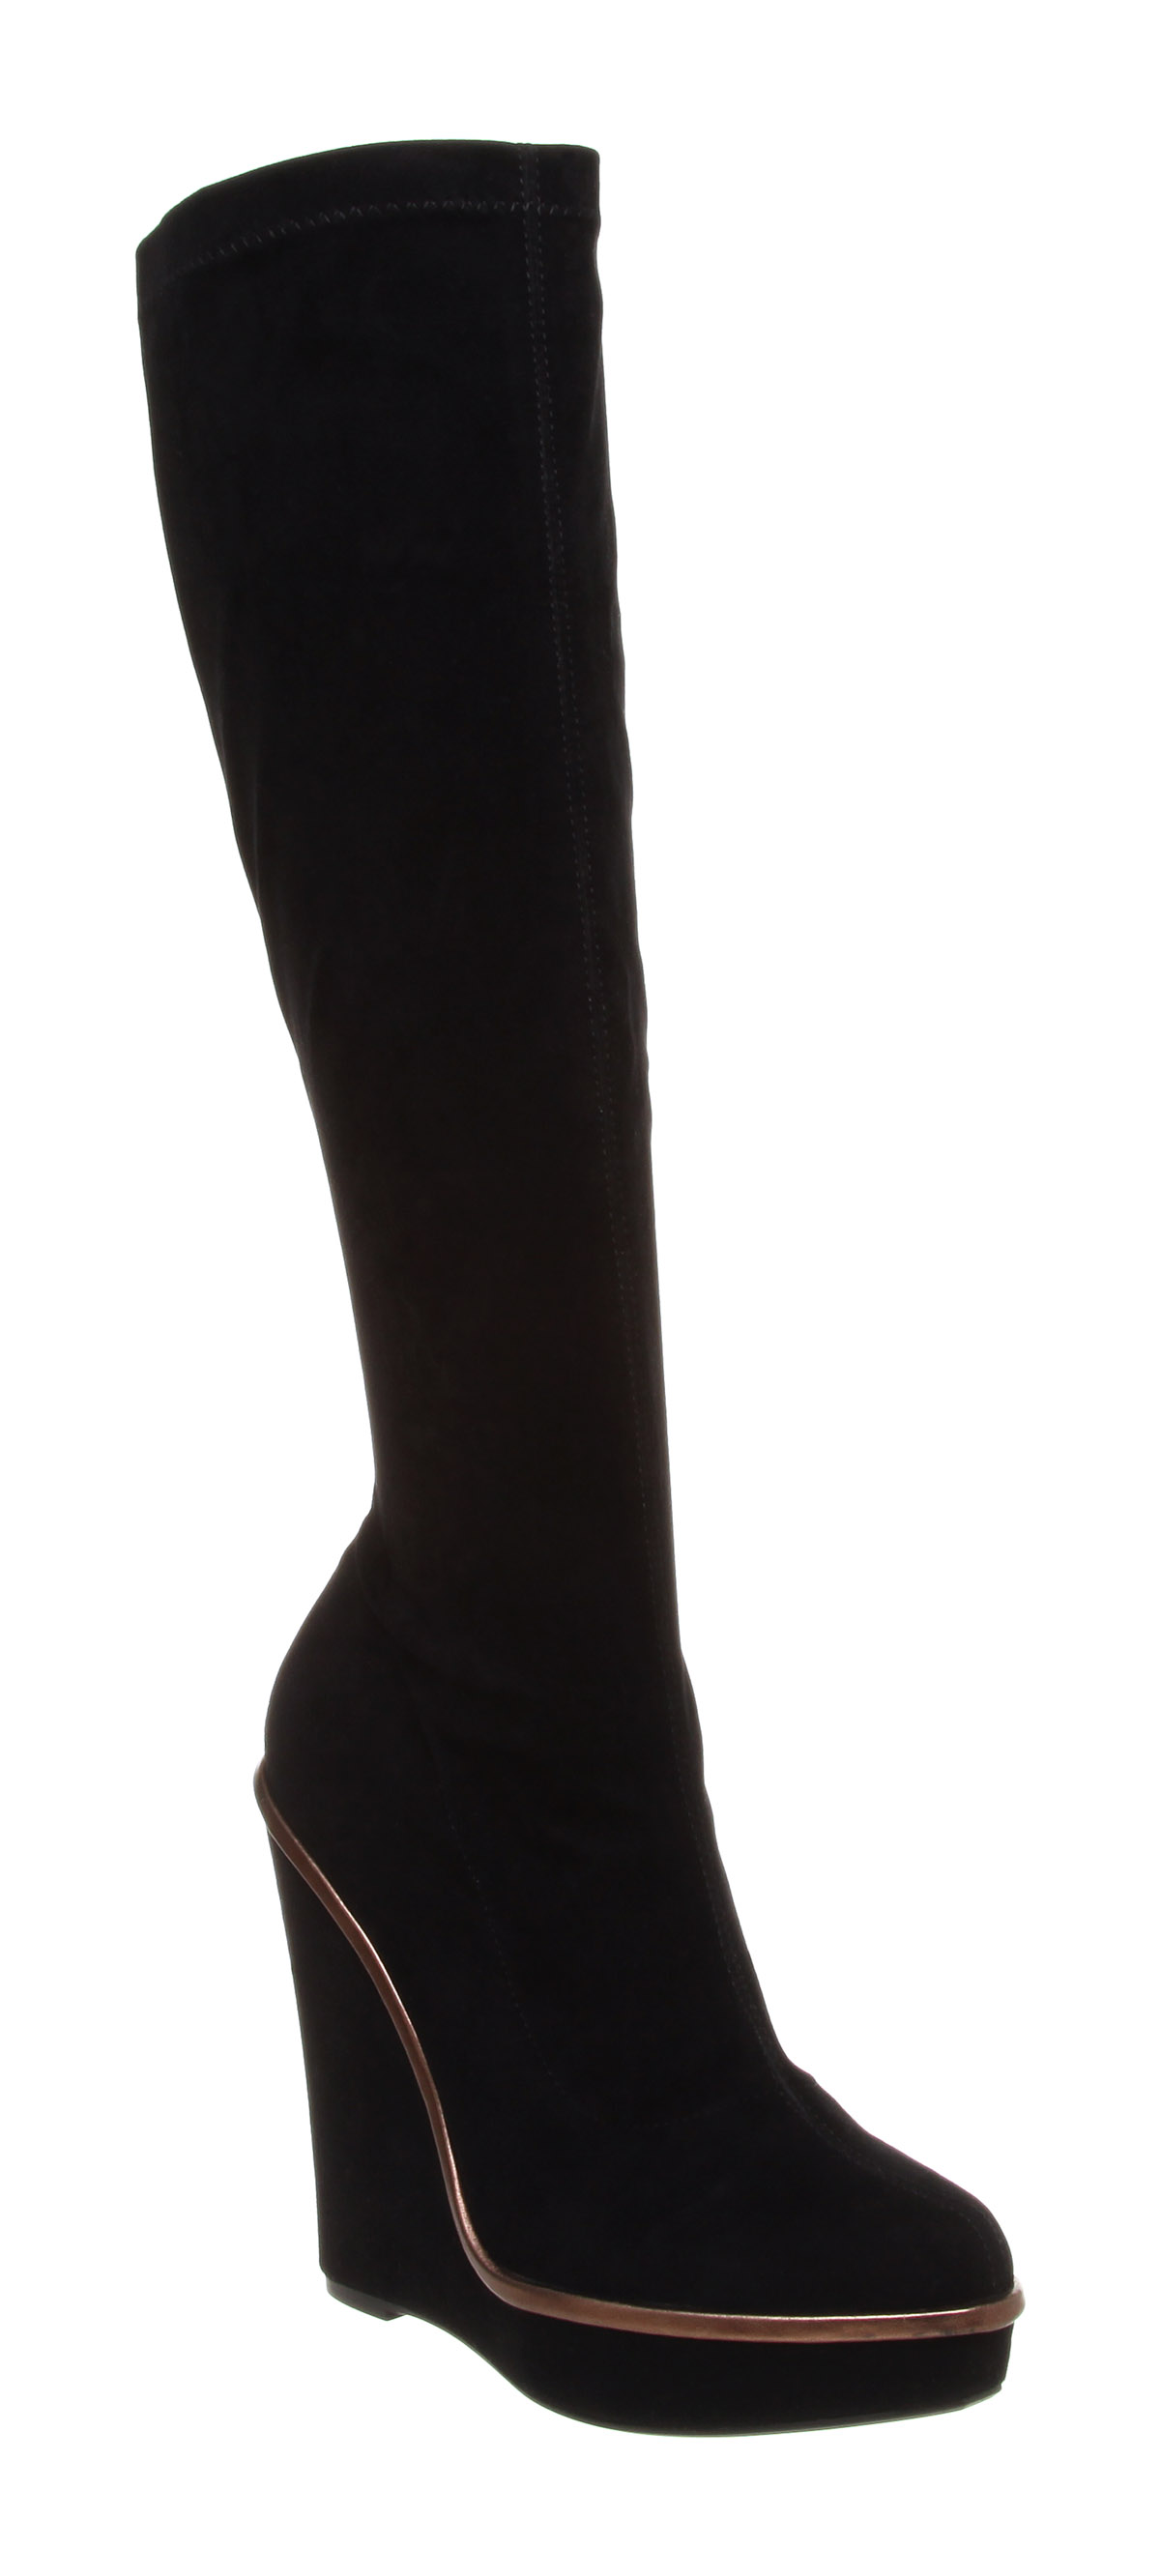 9f4228bf524 Идет загрузка изображения Office-Celeste-Stretch-Wedge-Boots-Black-Stretch- Boots-